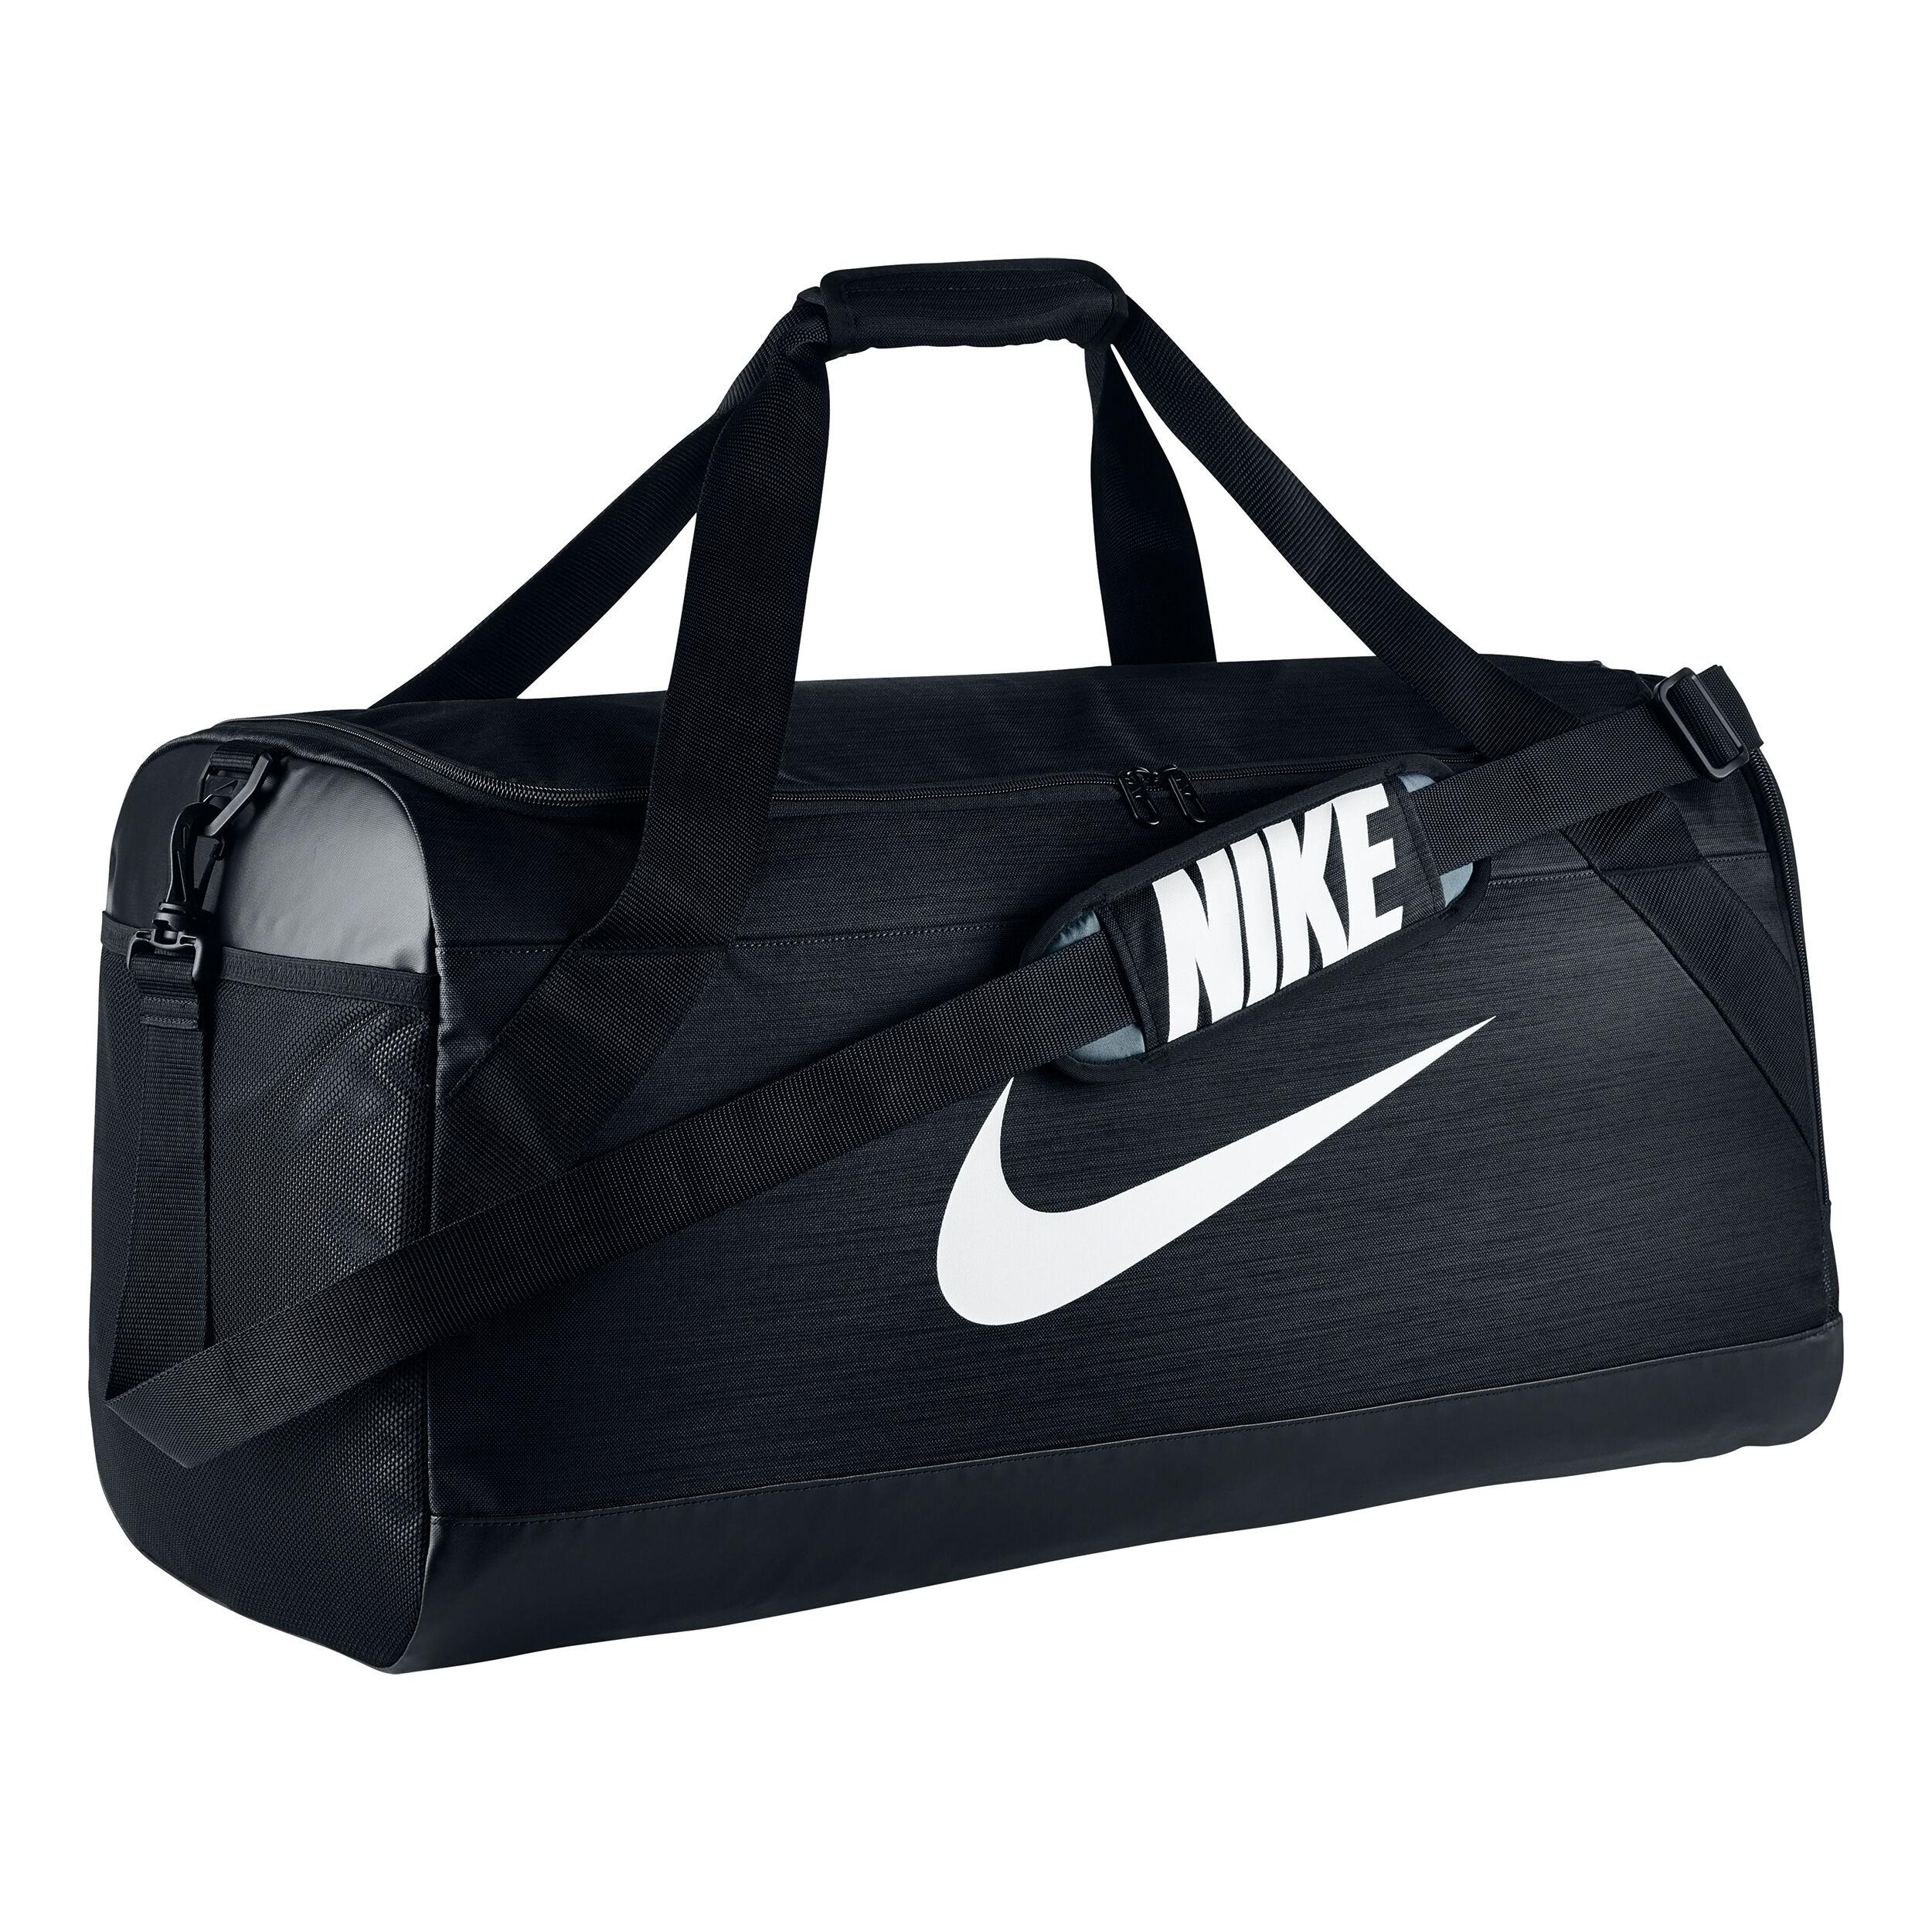 Deporte NegroNegro Brasilia Bolsa Compra Duffel Nike Grande pqSUMVzG